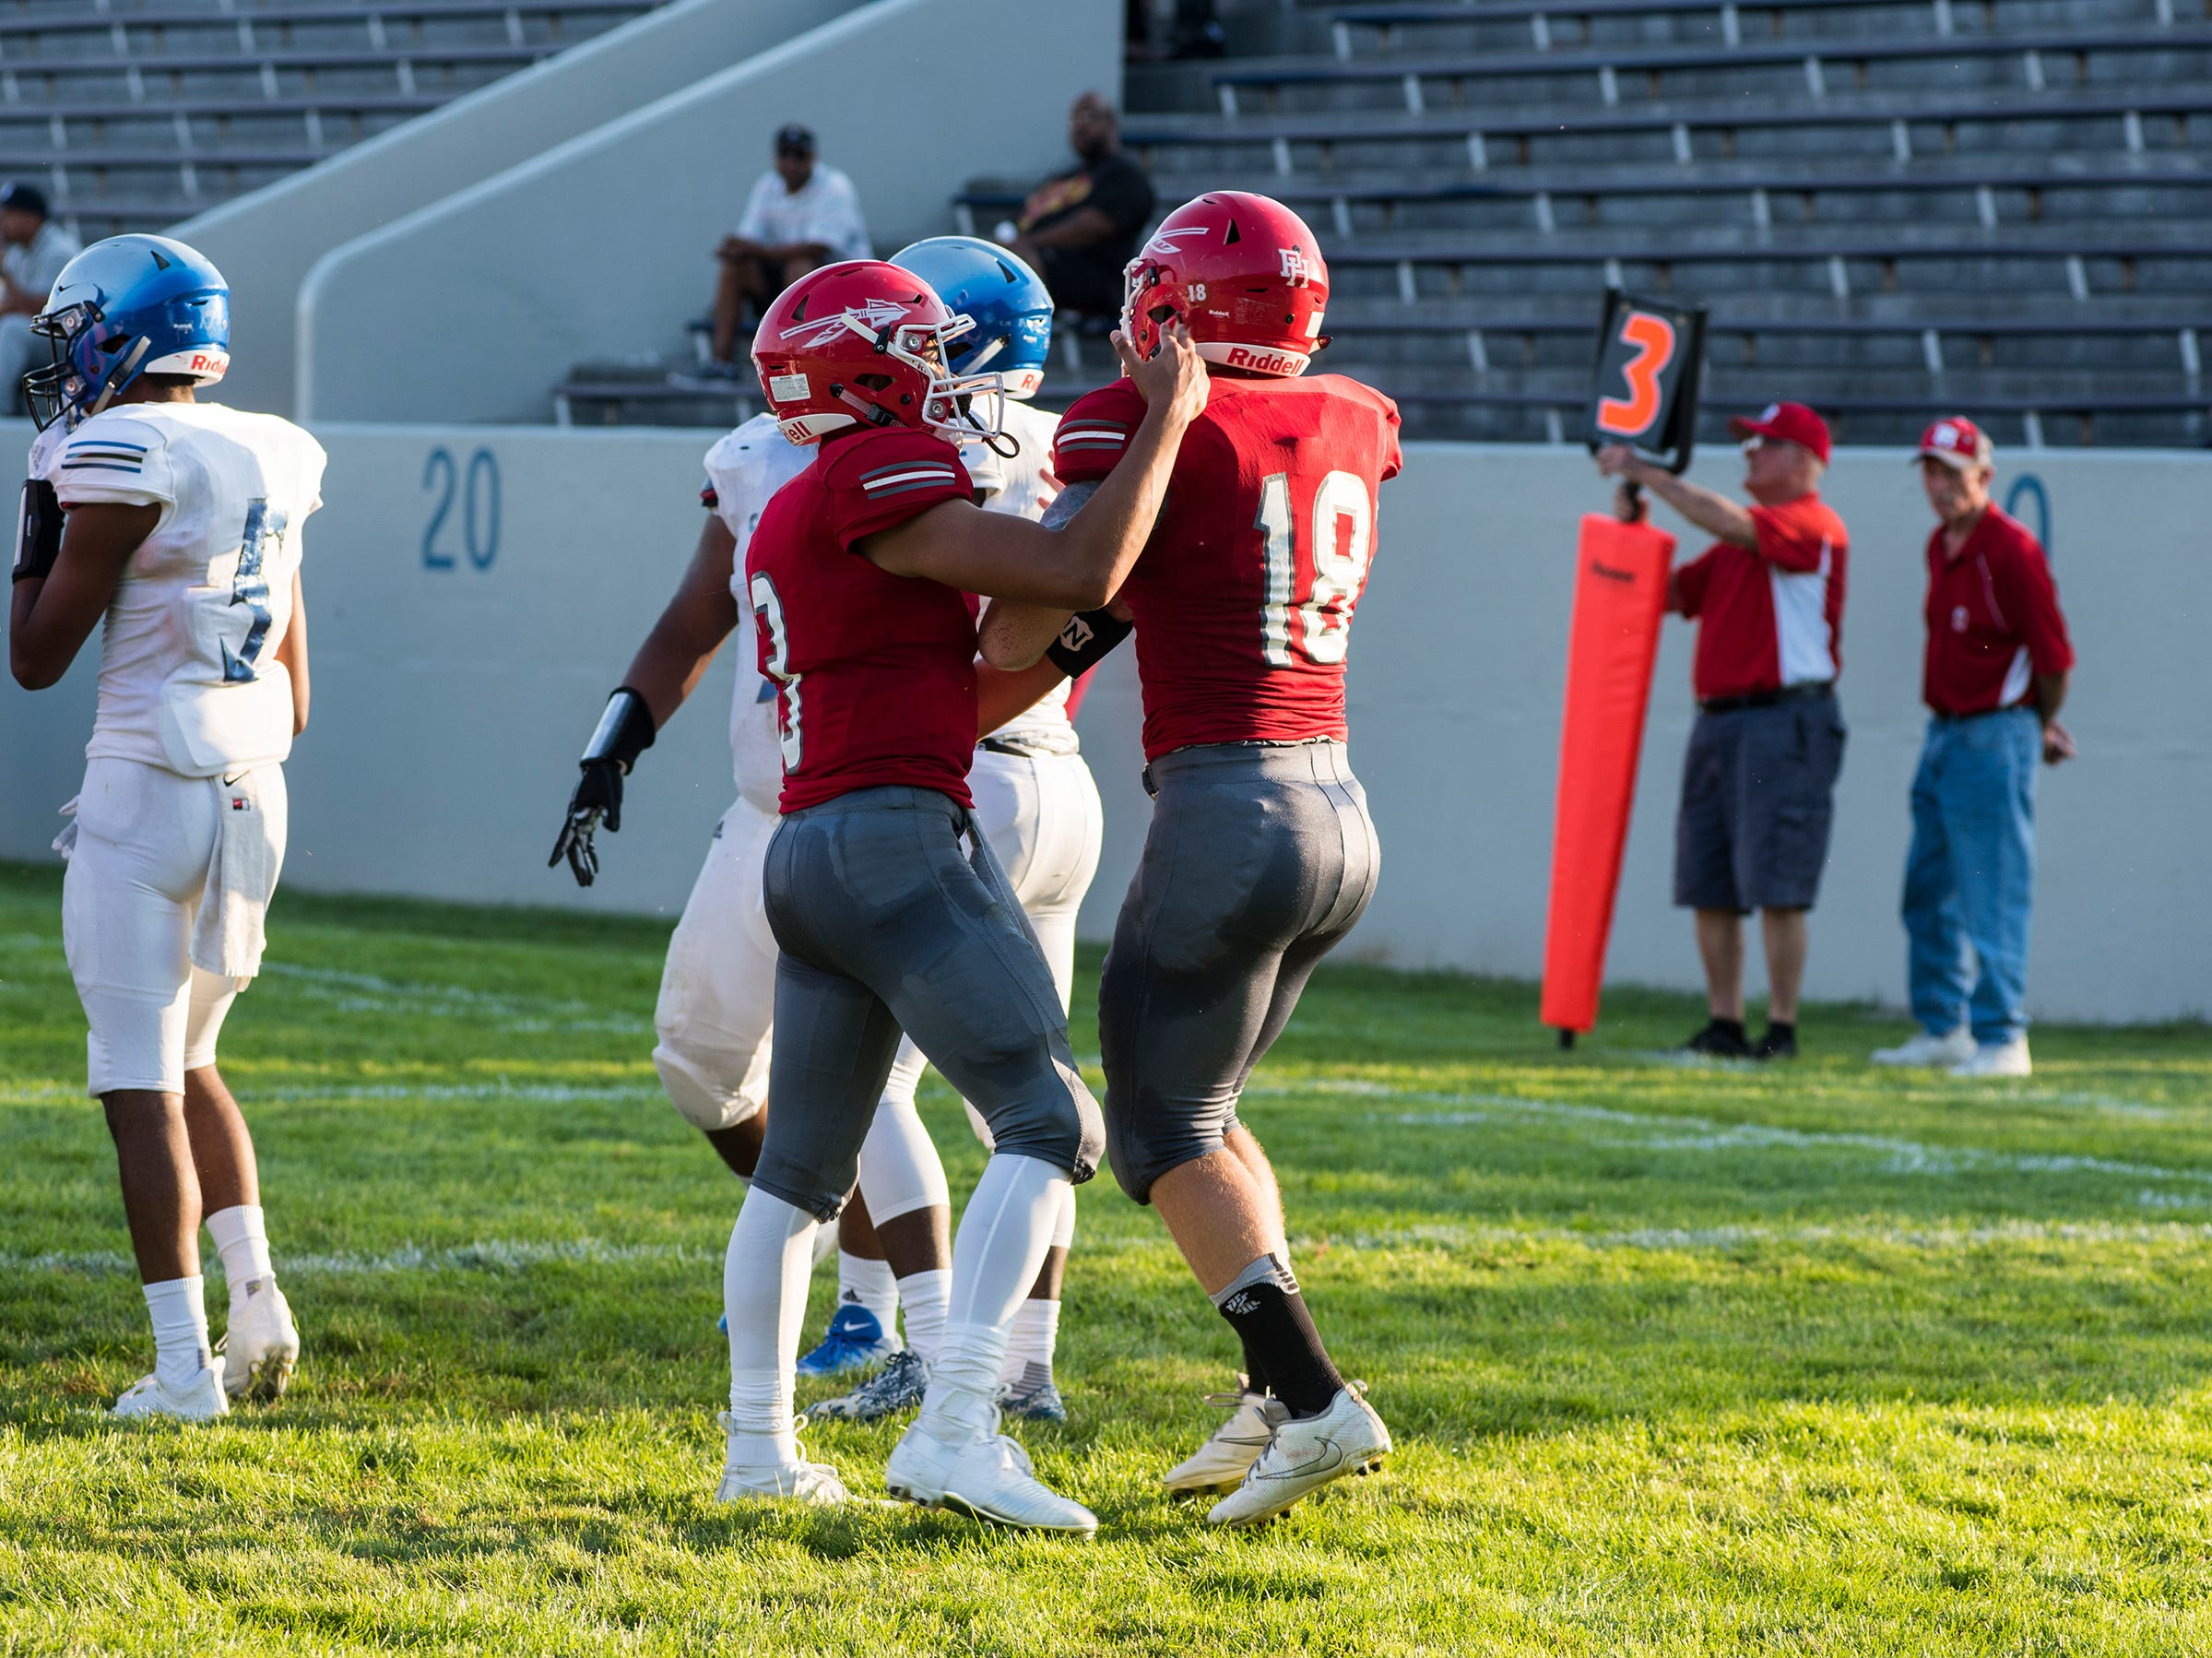 Port Huron High School quarterback Jonny Oriel (3) and running back Josh Butler celebrate after Butler scored the team's first touchdown during their game against Carman-Ainsworth High School Thursday, Aug. 23, 2018, at Memorial Stadium.